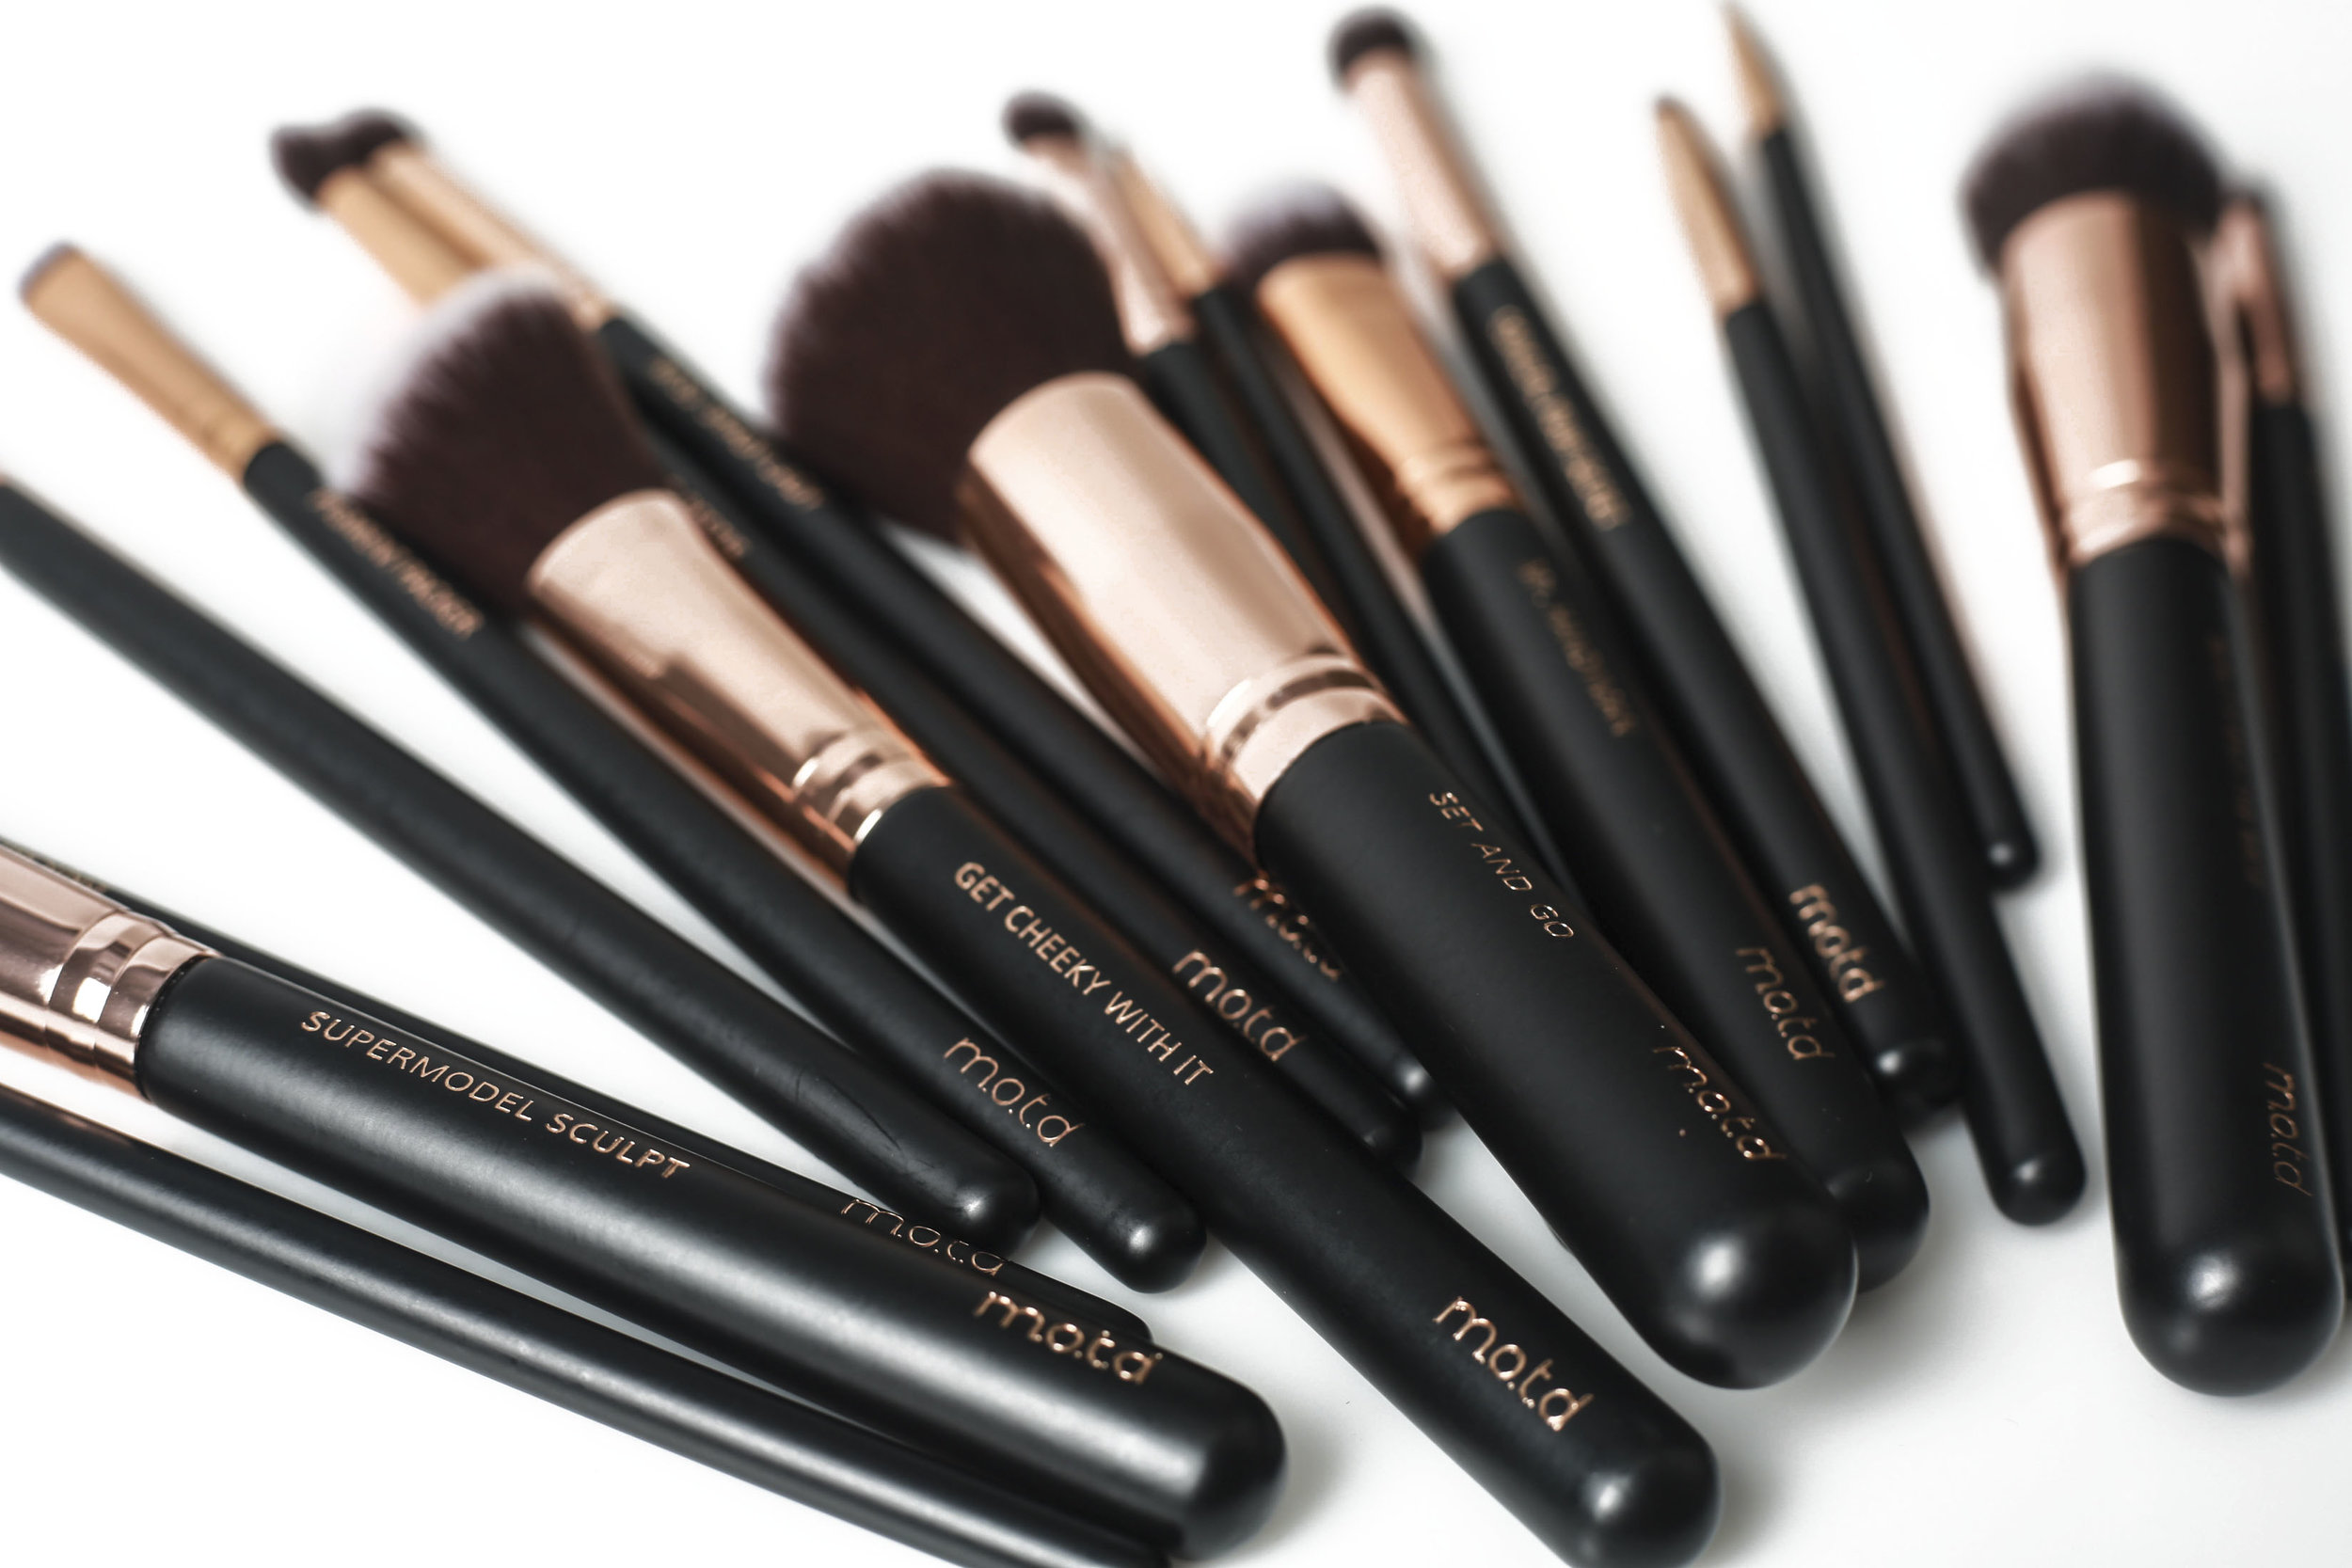 MOTD_Cosmetics-12.jpg